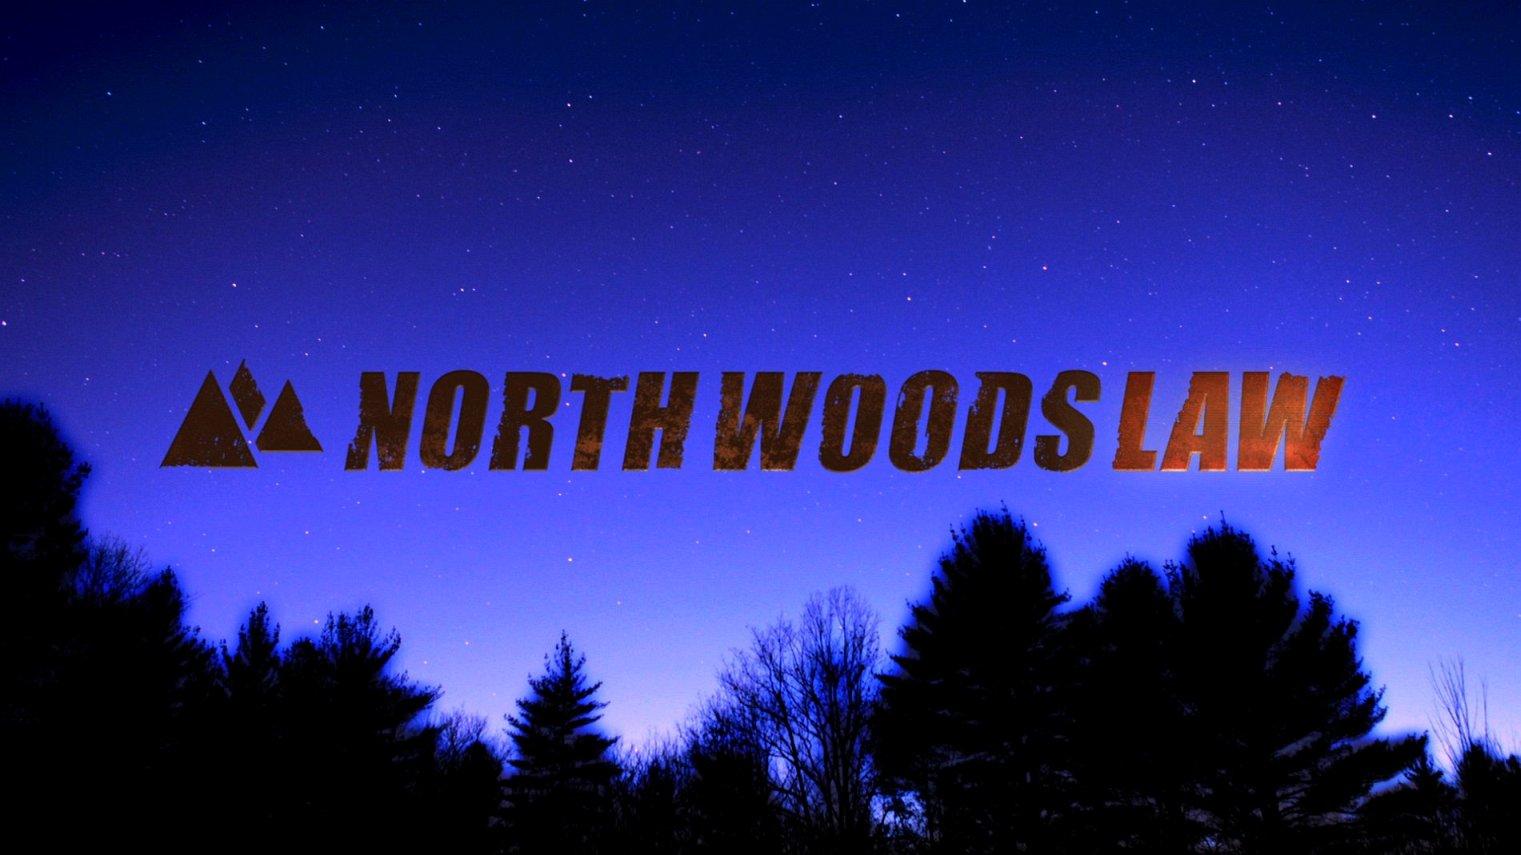 cast of North Woods Law season 5